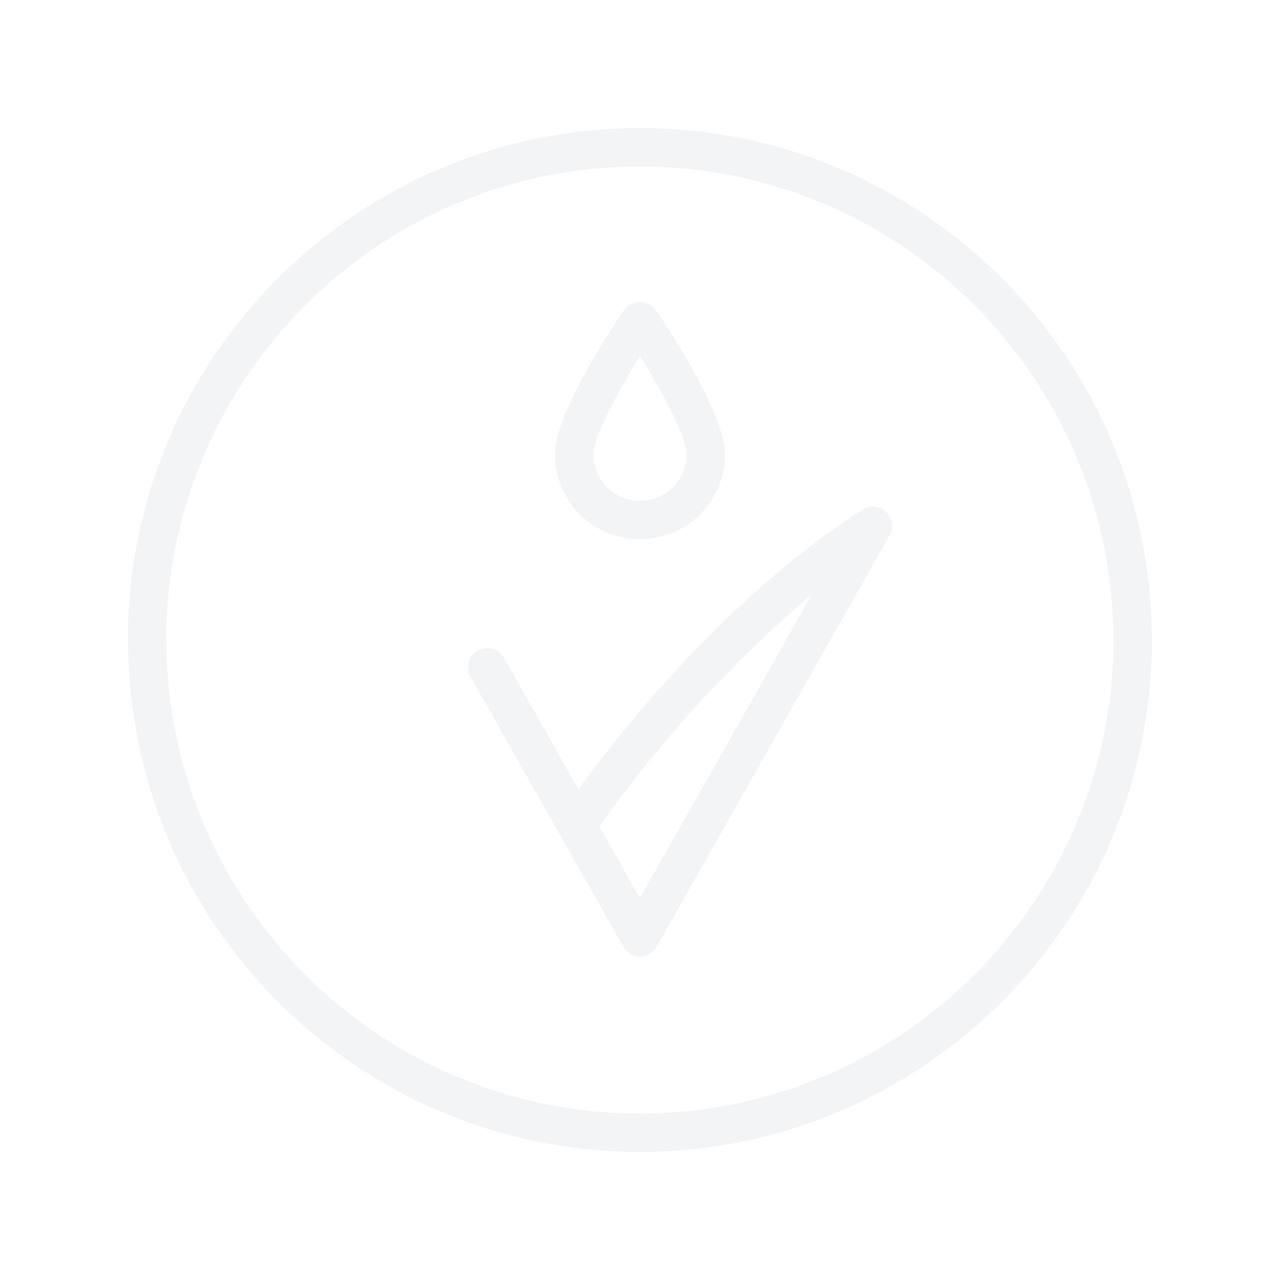 LA ROCHE-POSAY Hydraphase Intense Masque 2x6ml